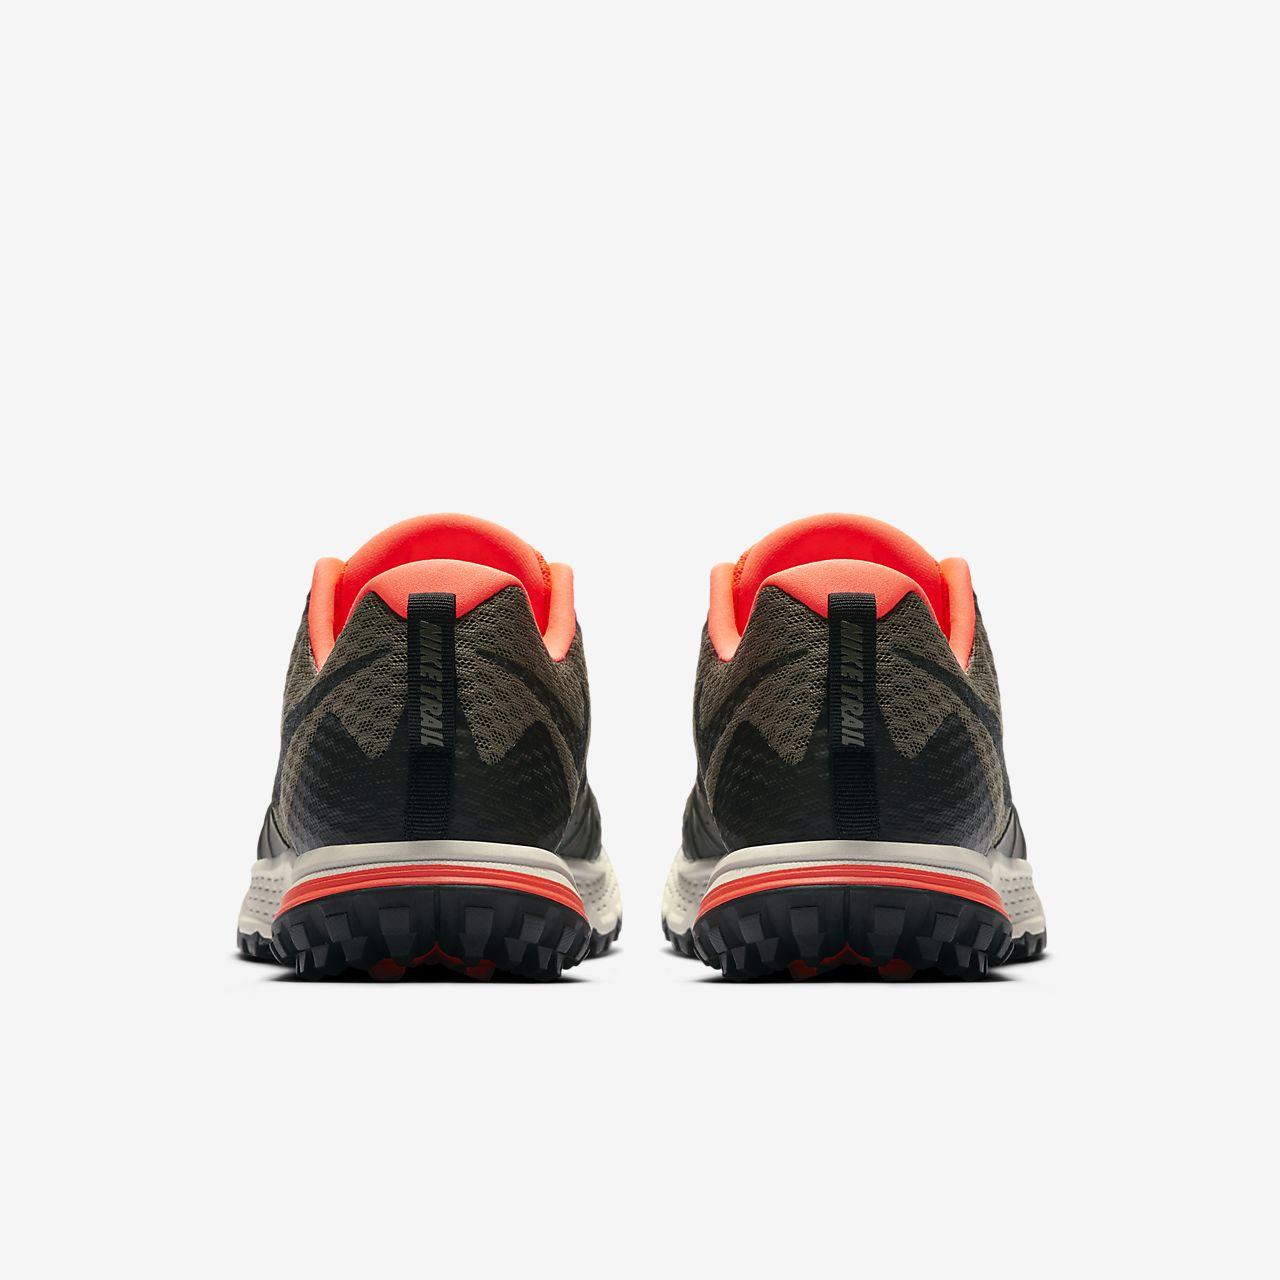 ... Nike Air Zoom Wildhorse 4 Men's Running Shoe